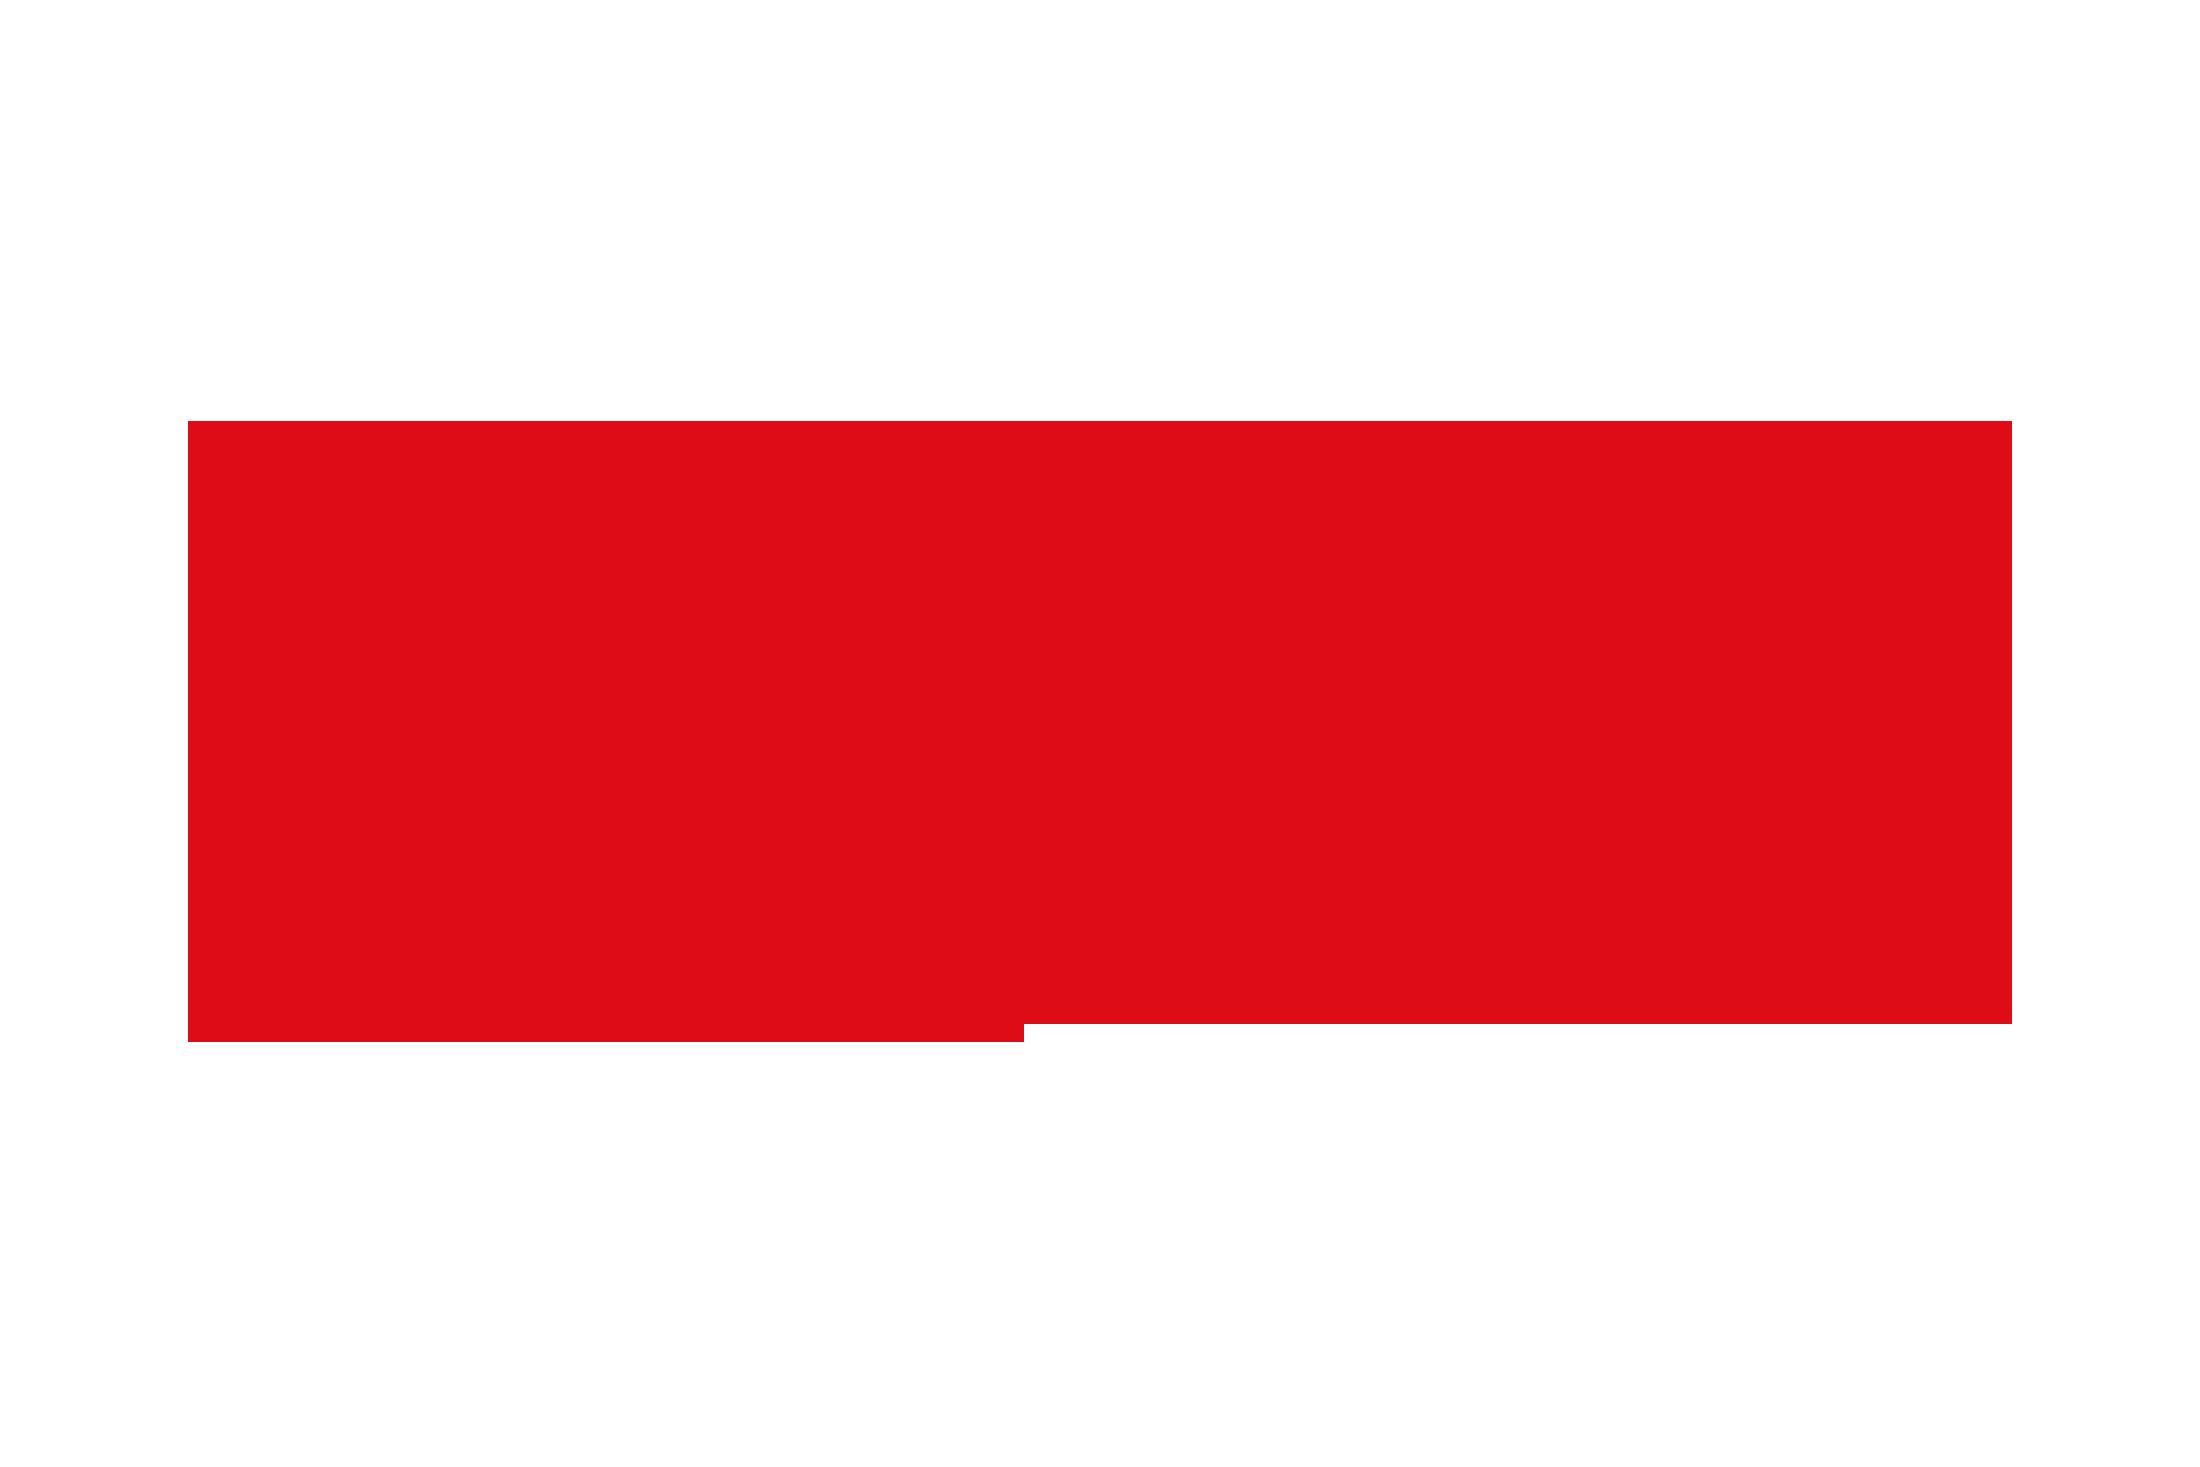 Grunge best buy label PSD